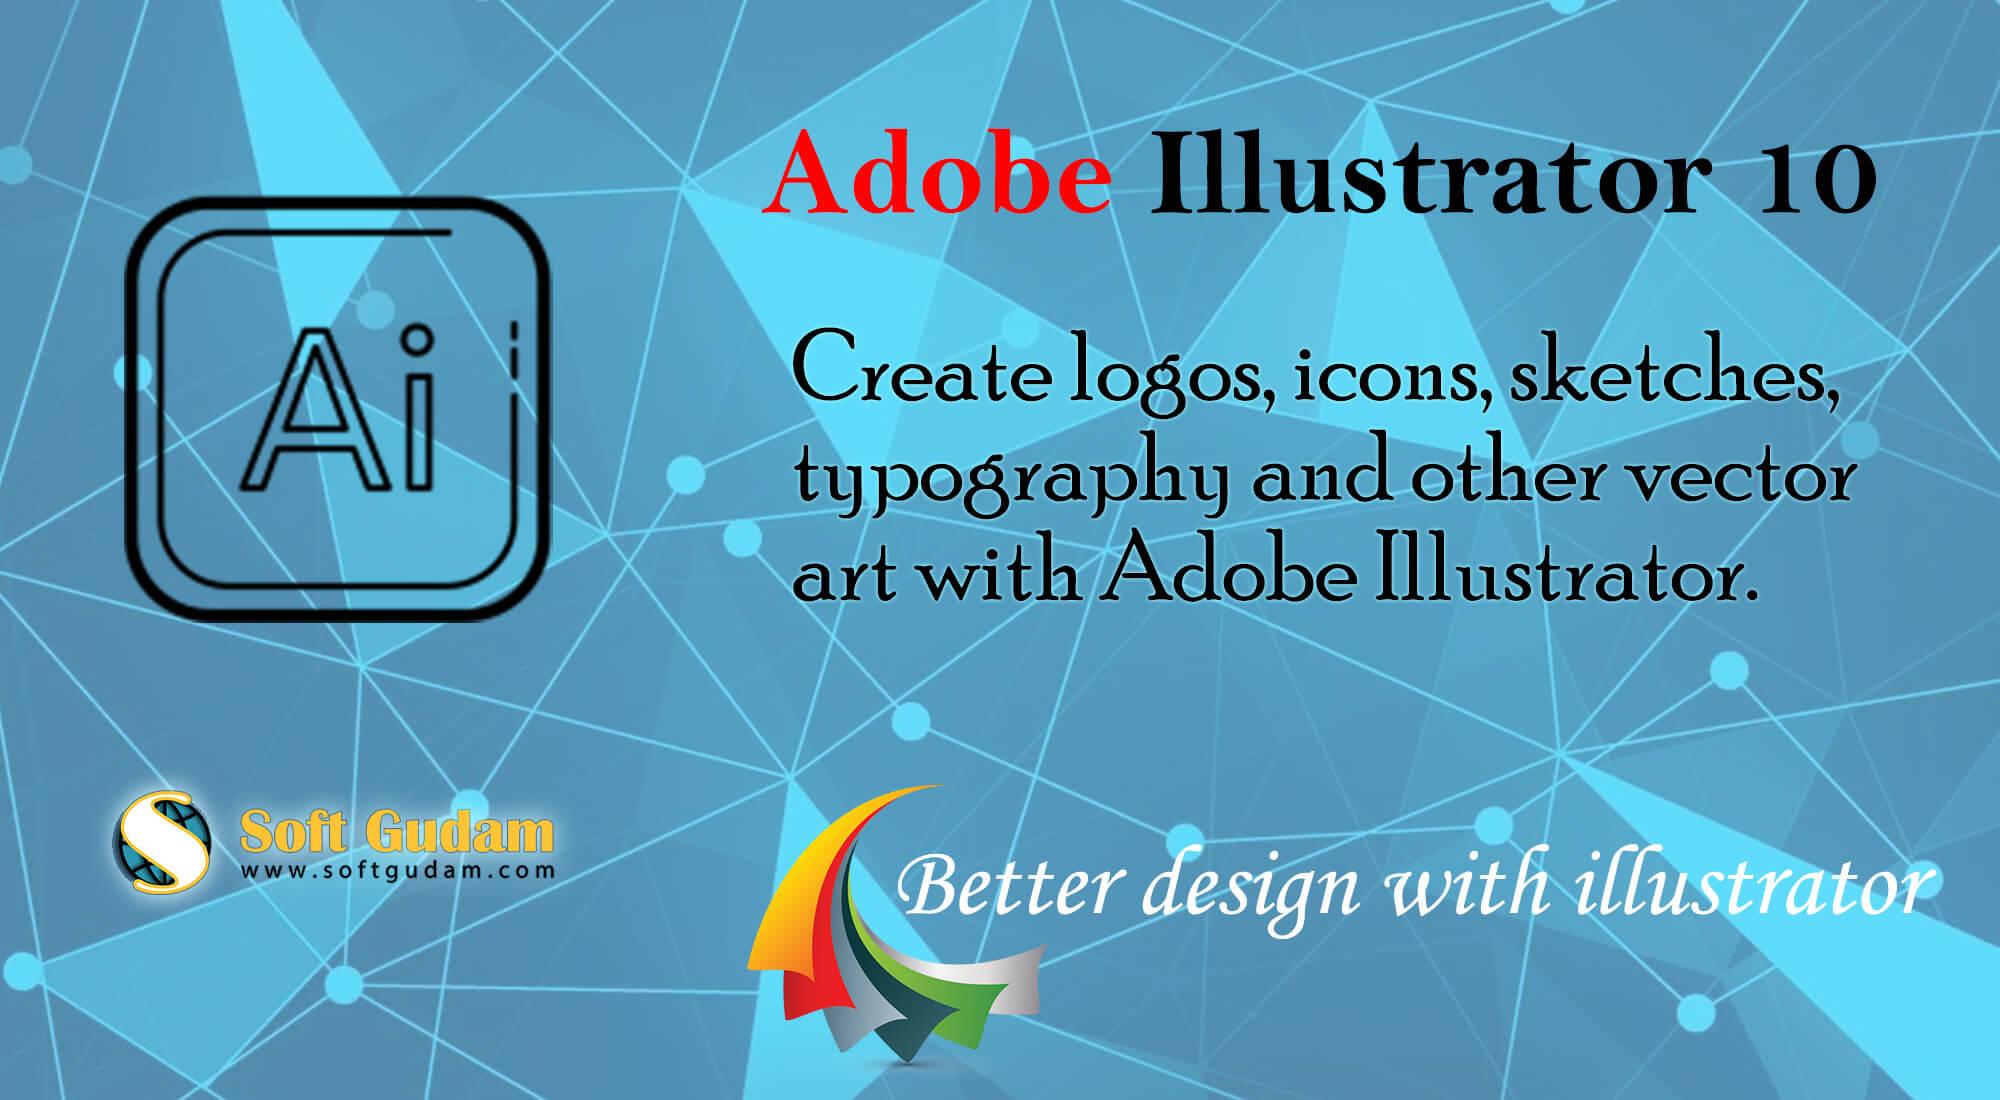 Adobe Illustrator 10